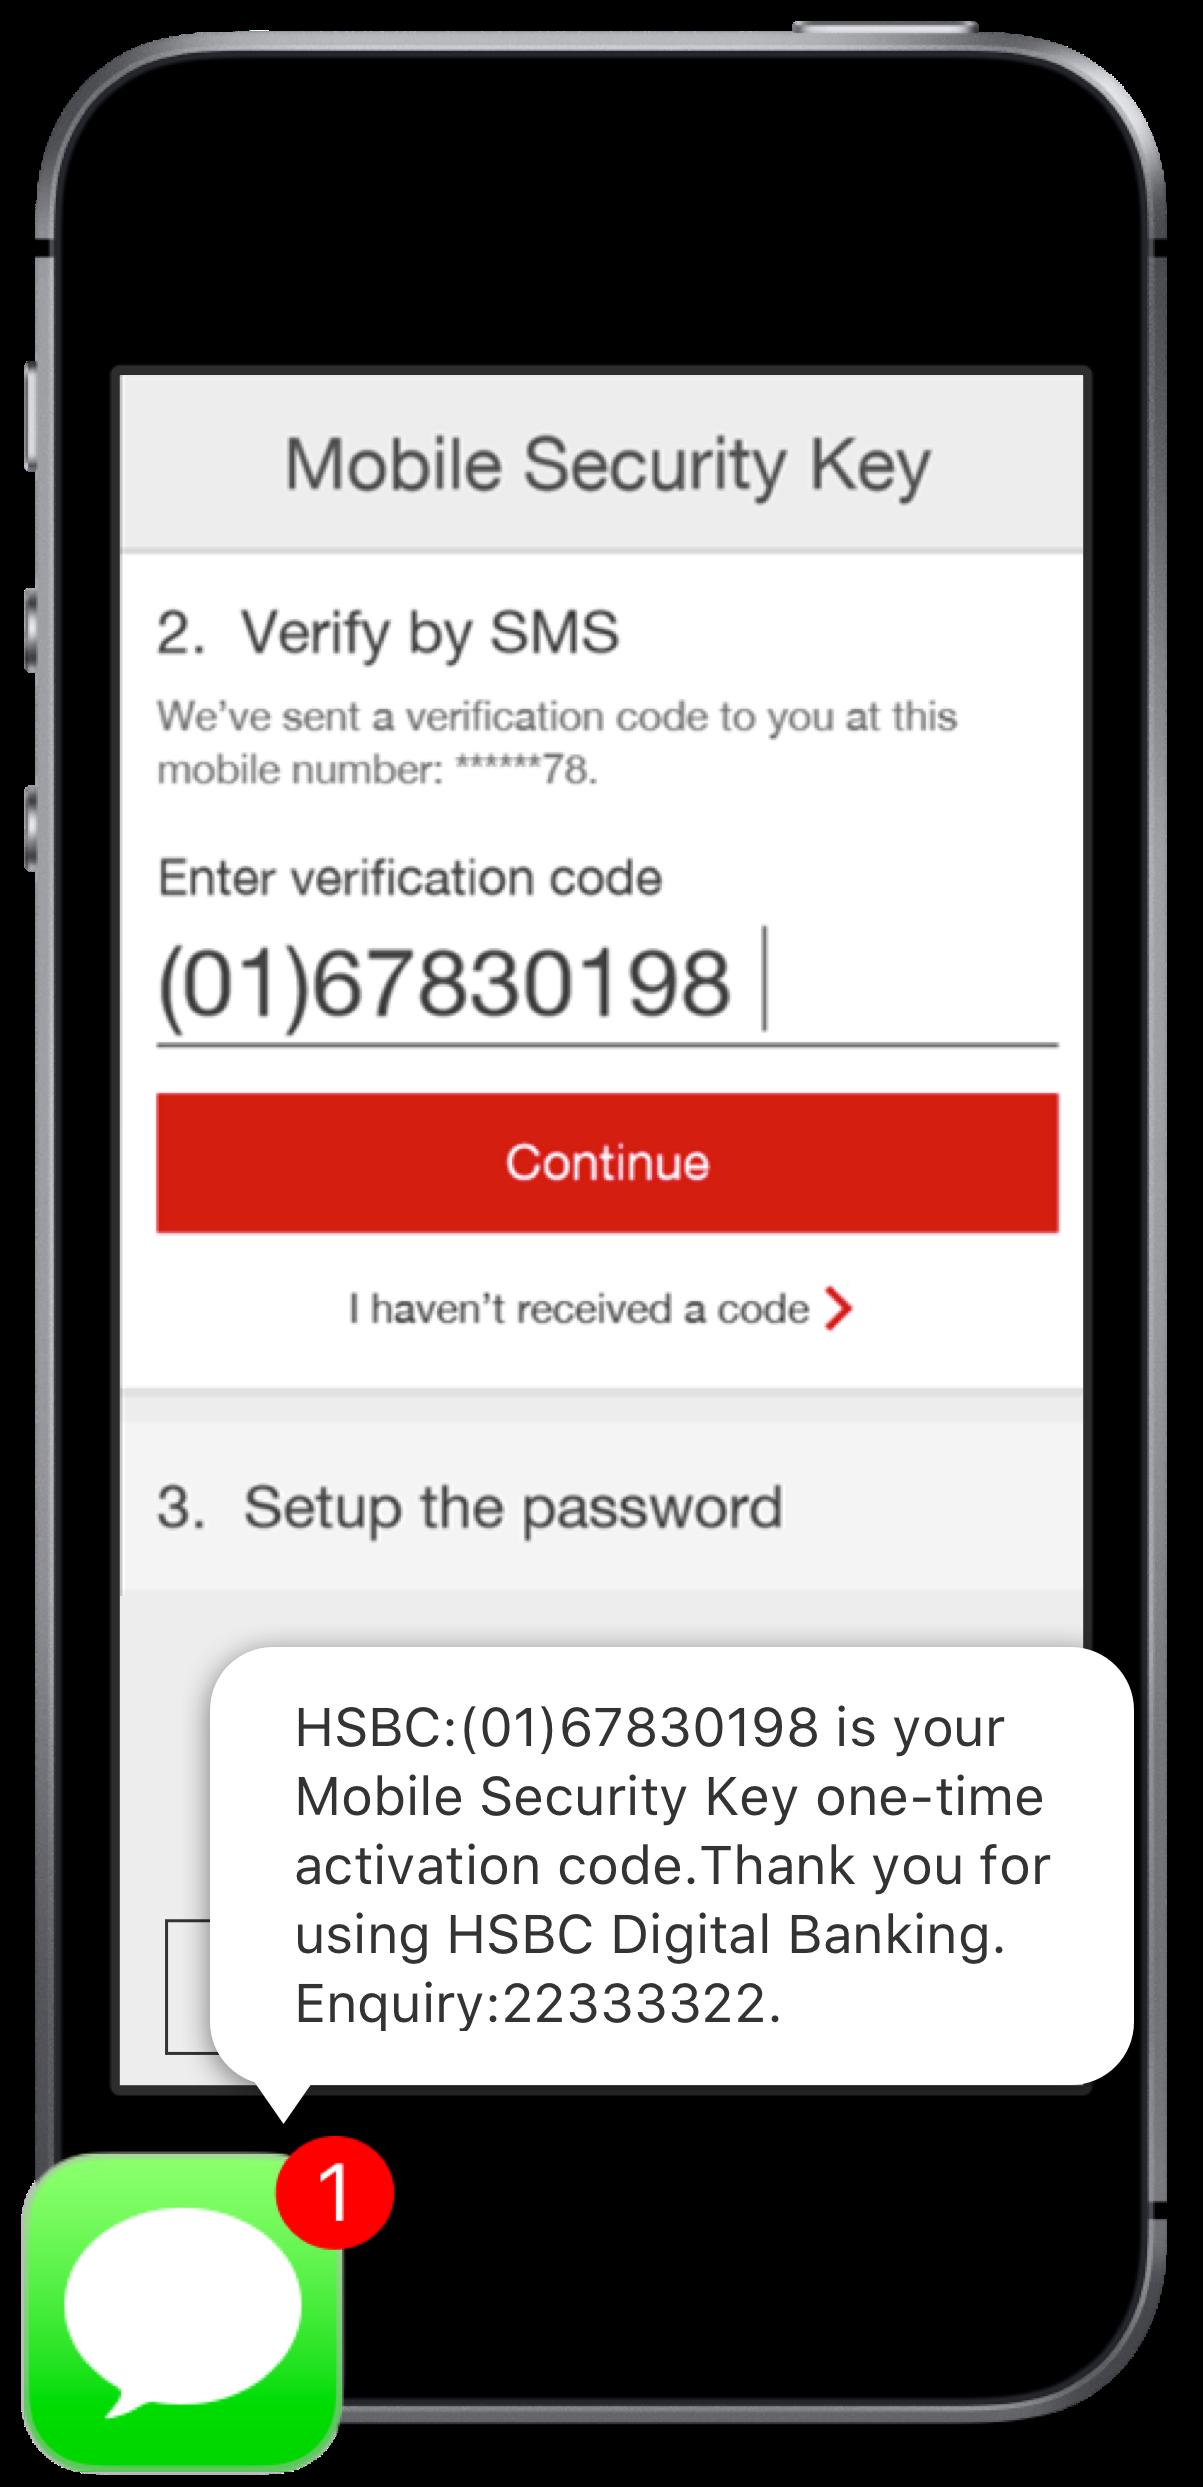 hsbc security key activation code